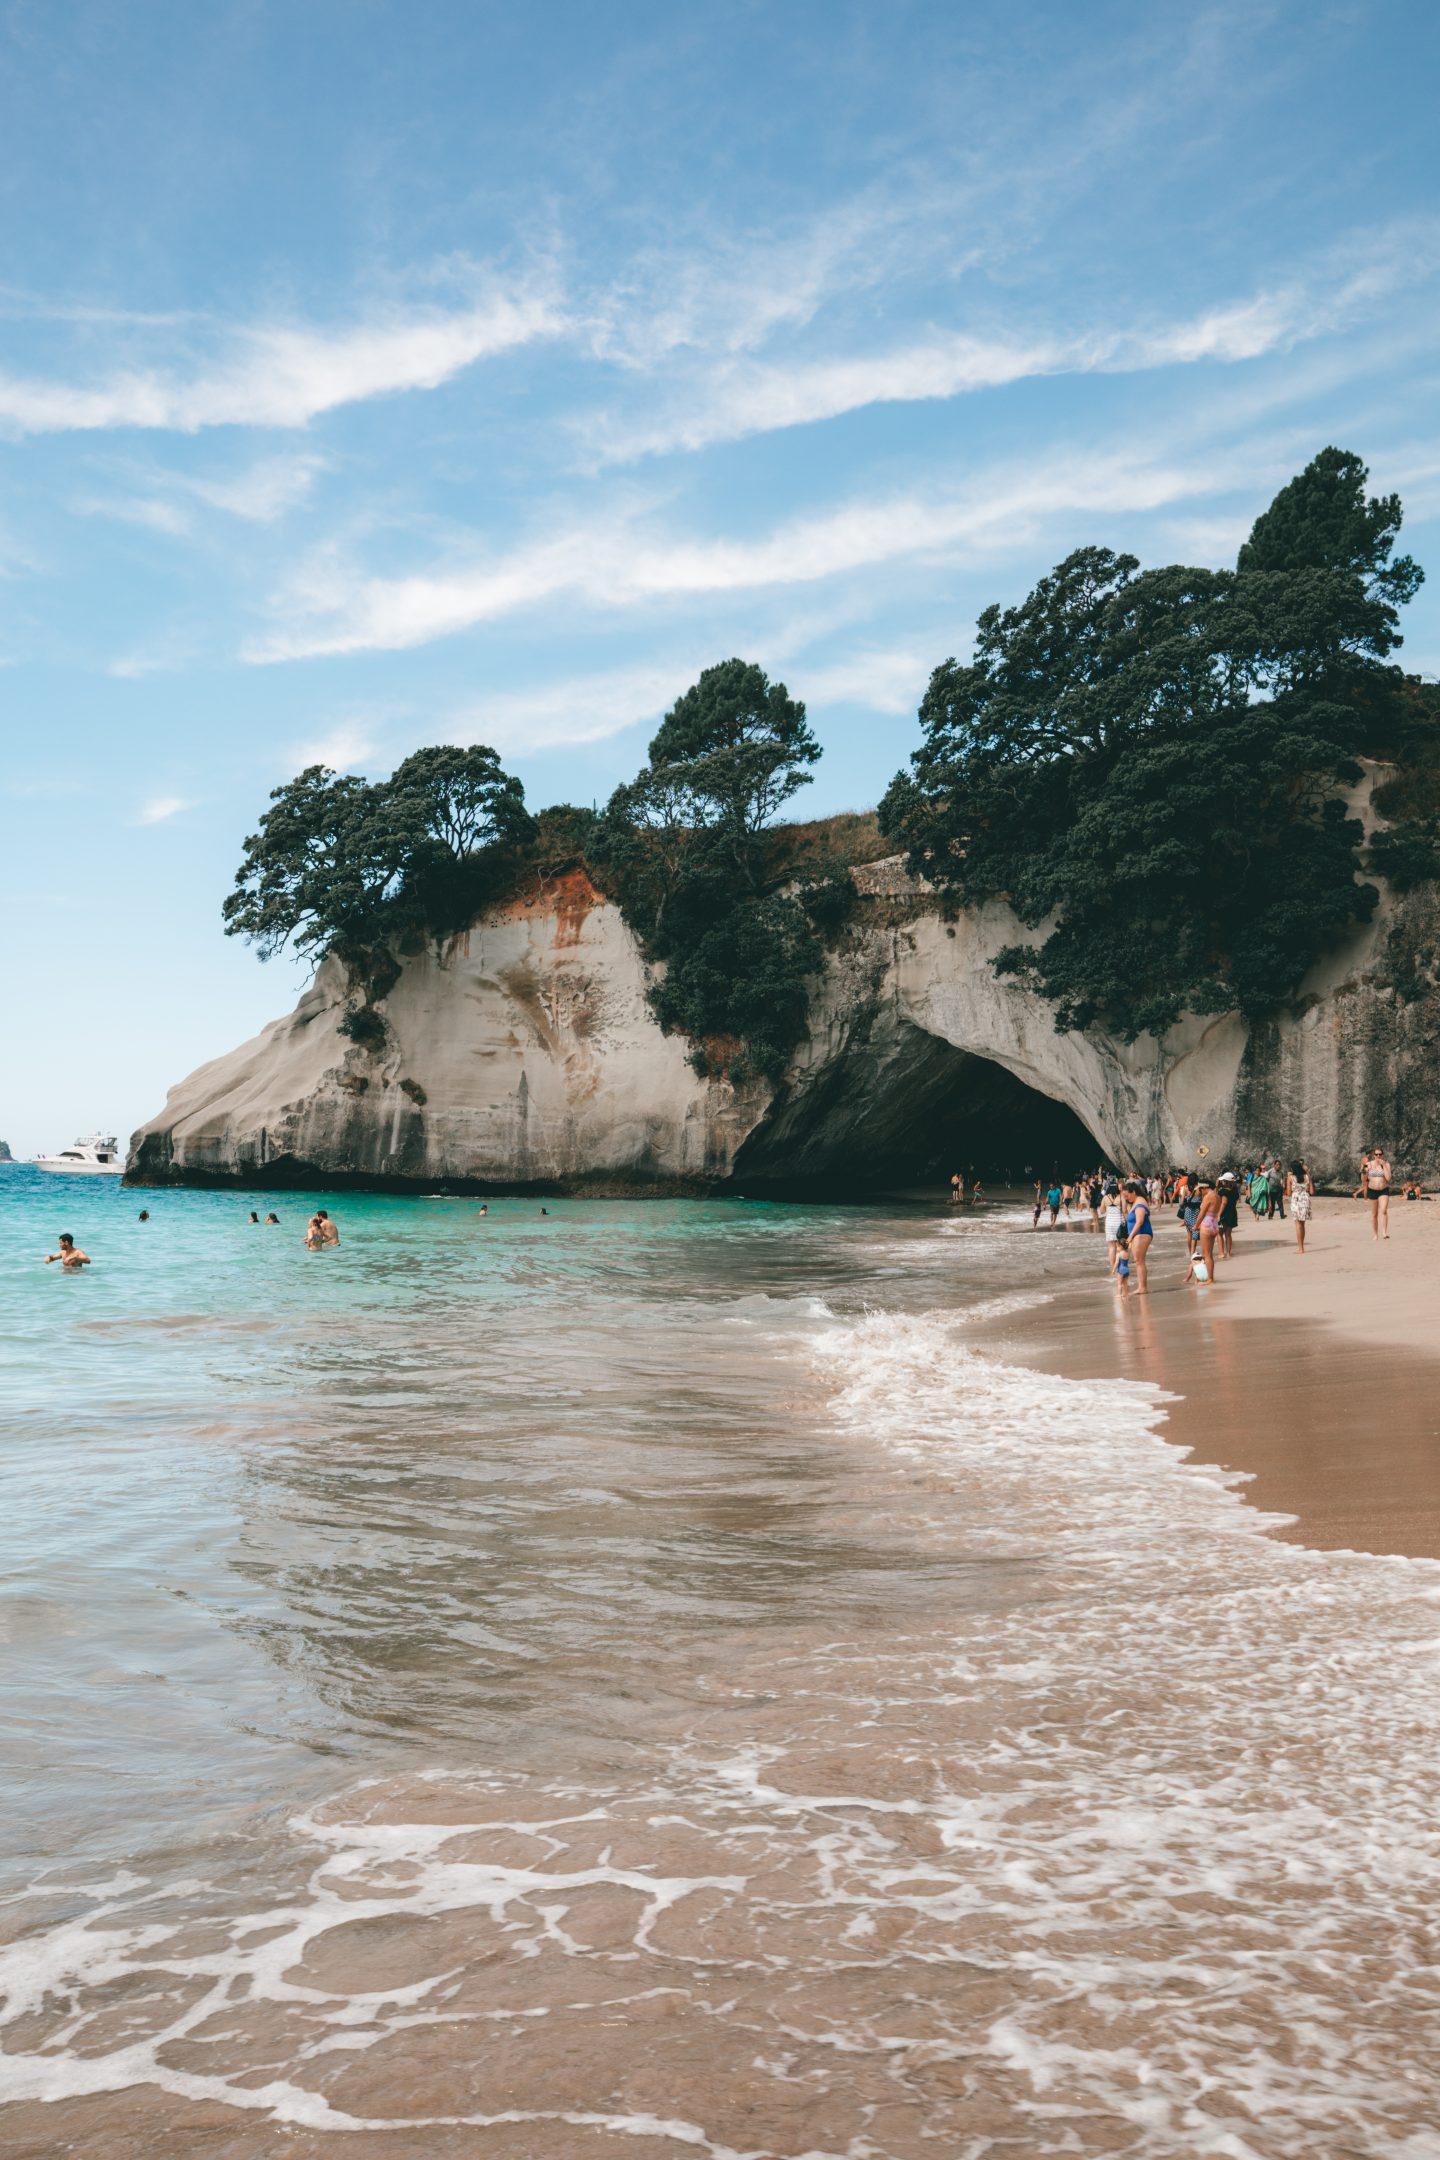 Cathedral Cove Nouvelle-Zélande - Blondie Baby blog voyages et mode